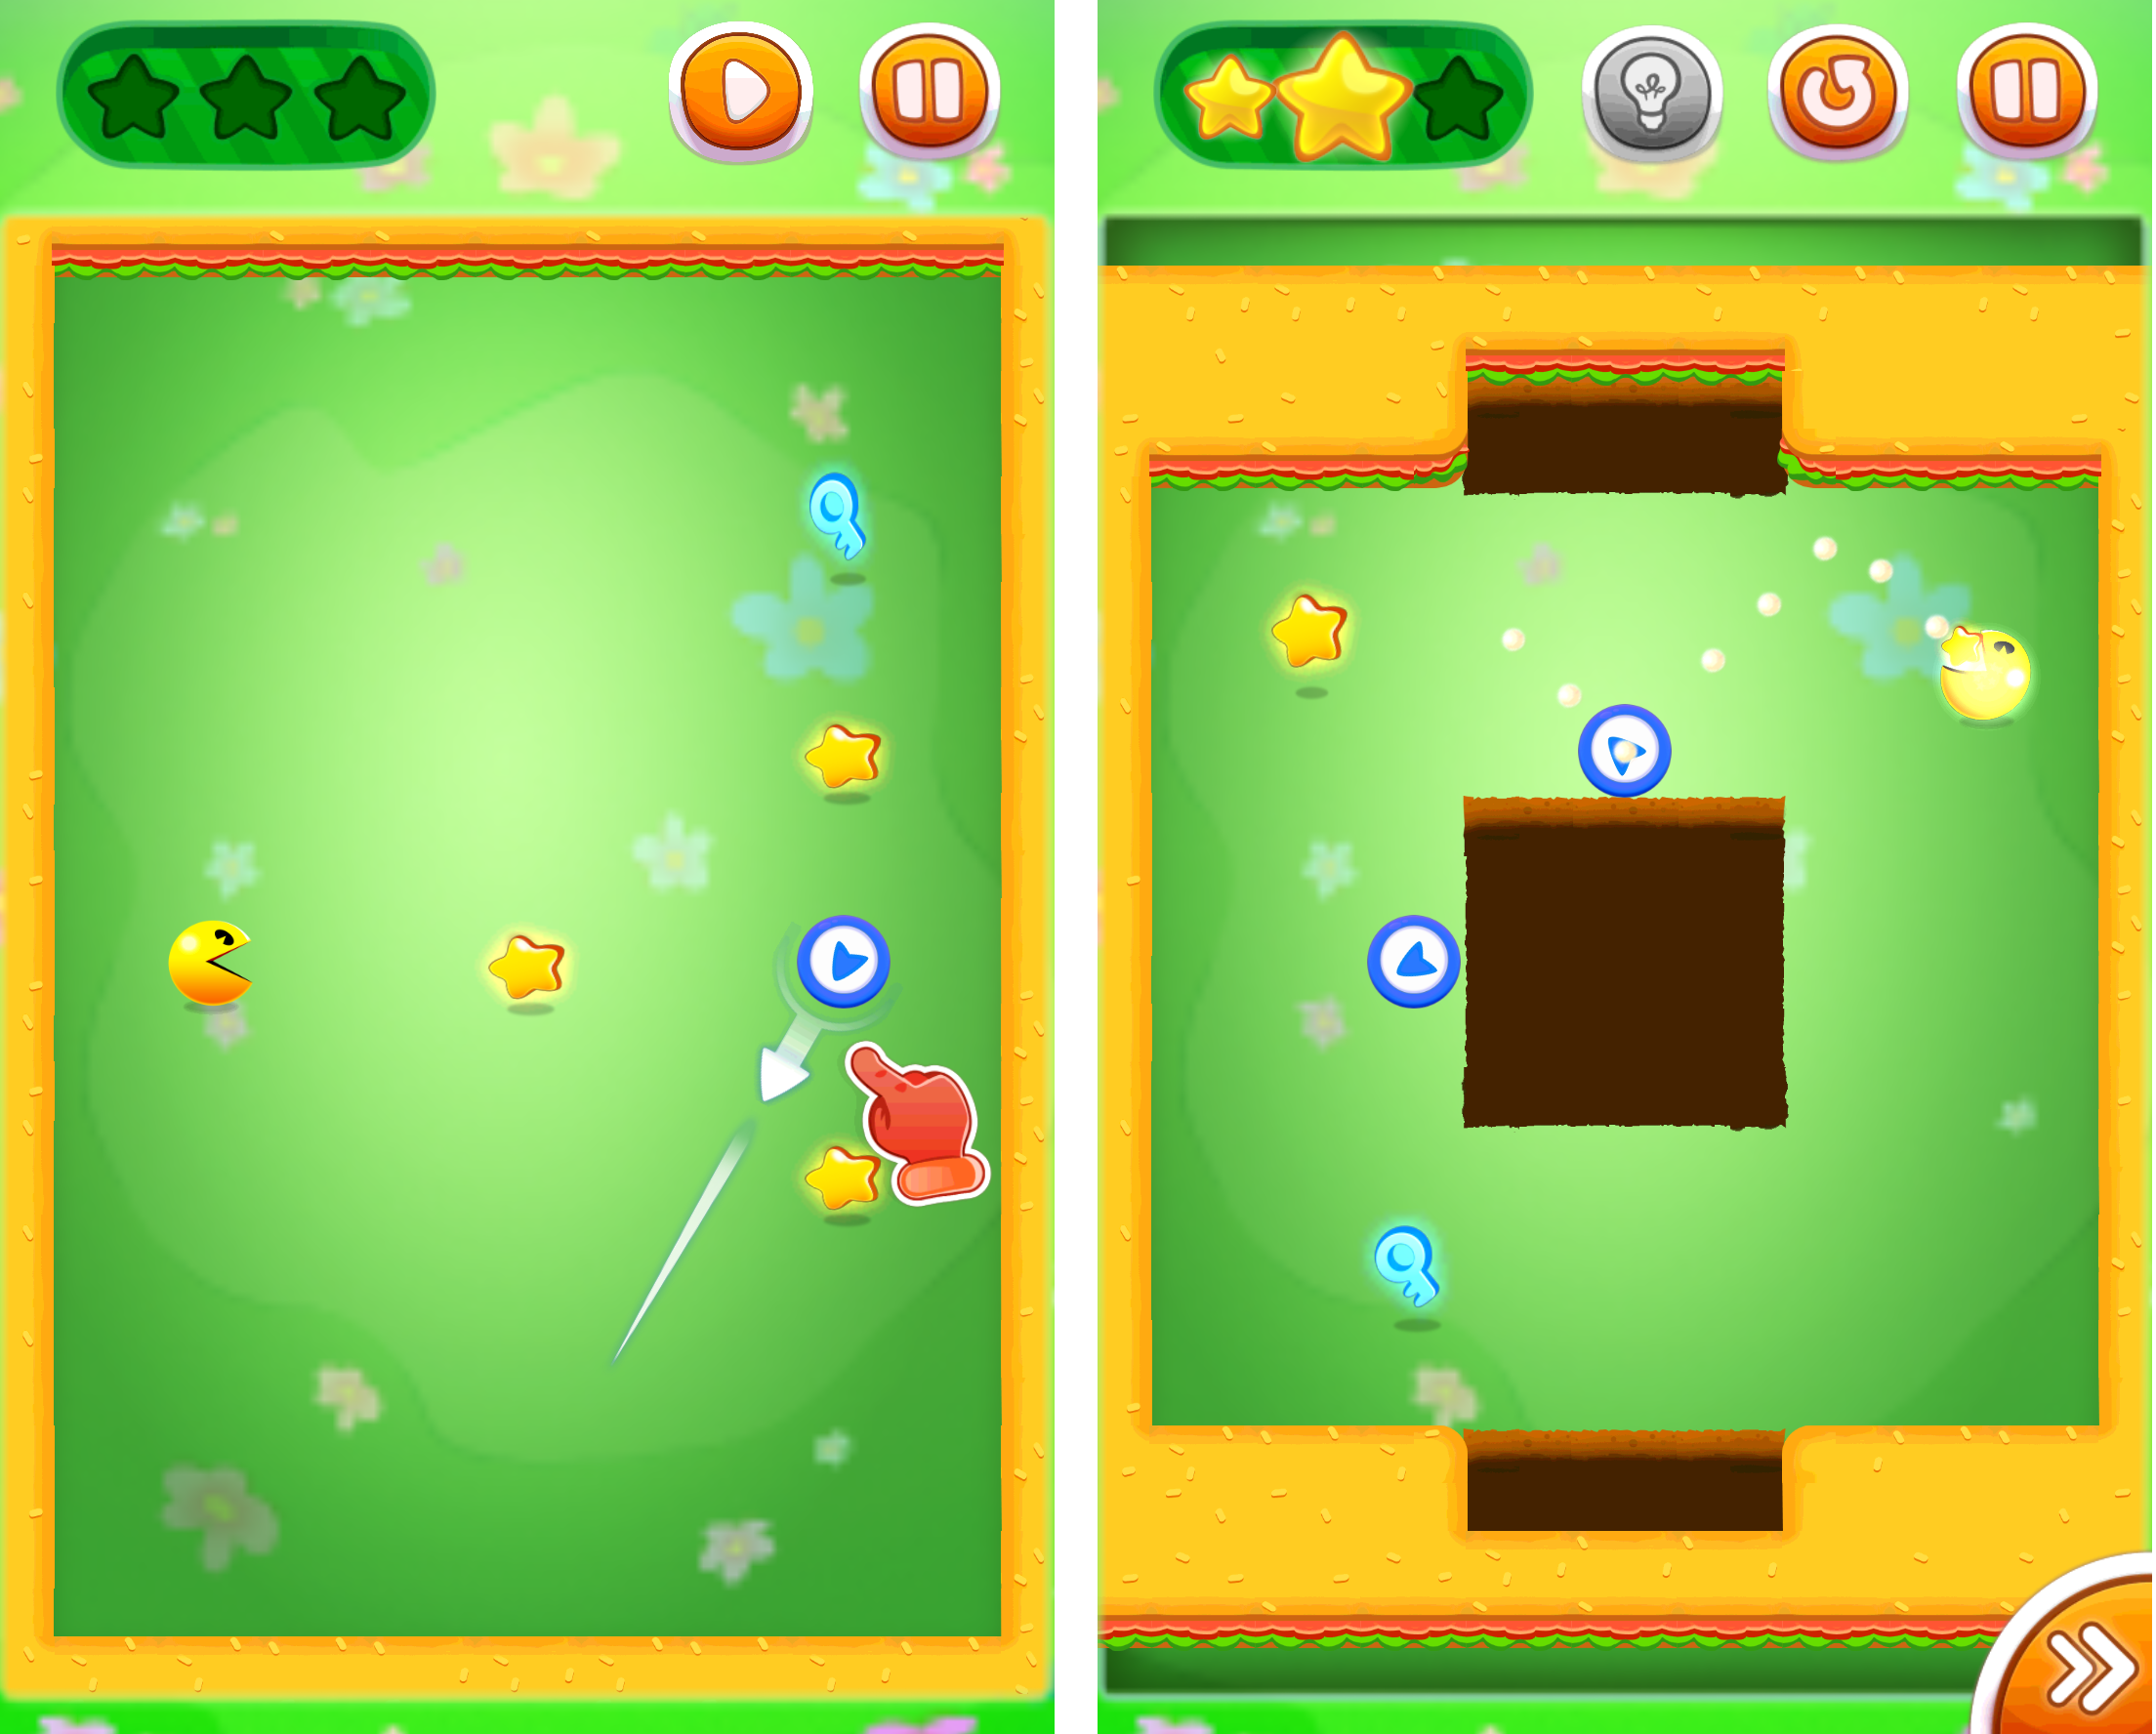 PAC-MAN Bounce - パズルアドベンチャー androidアプリスクリーンショット1